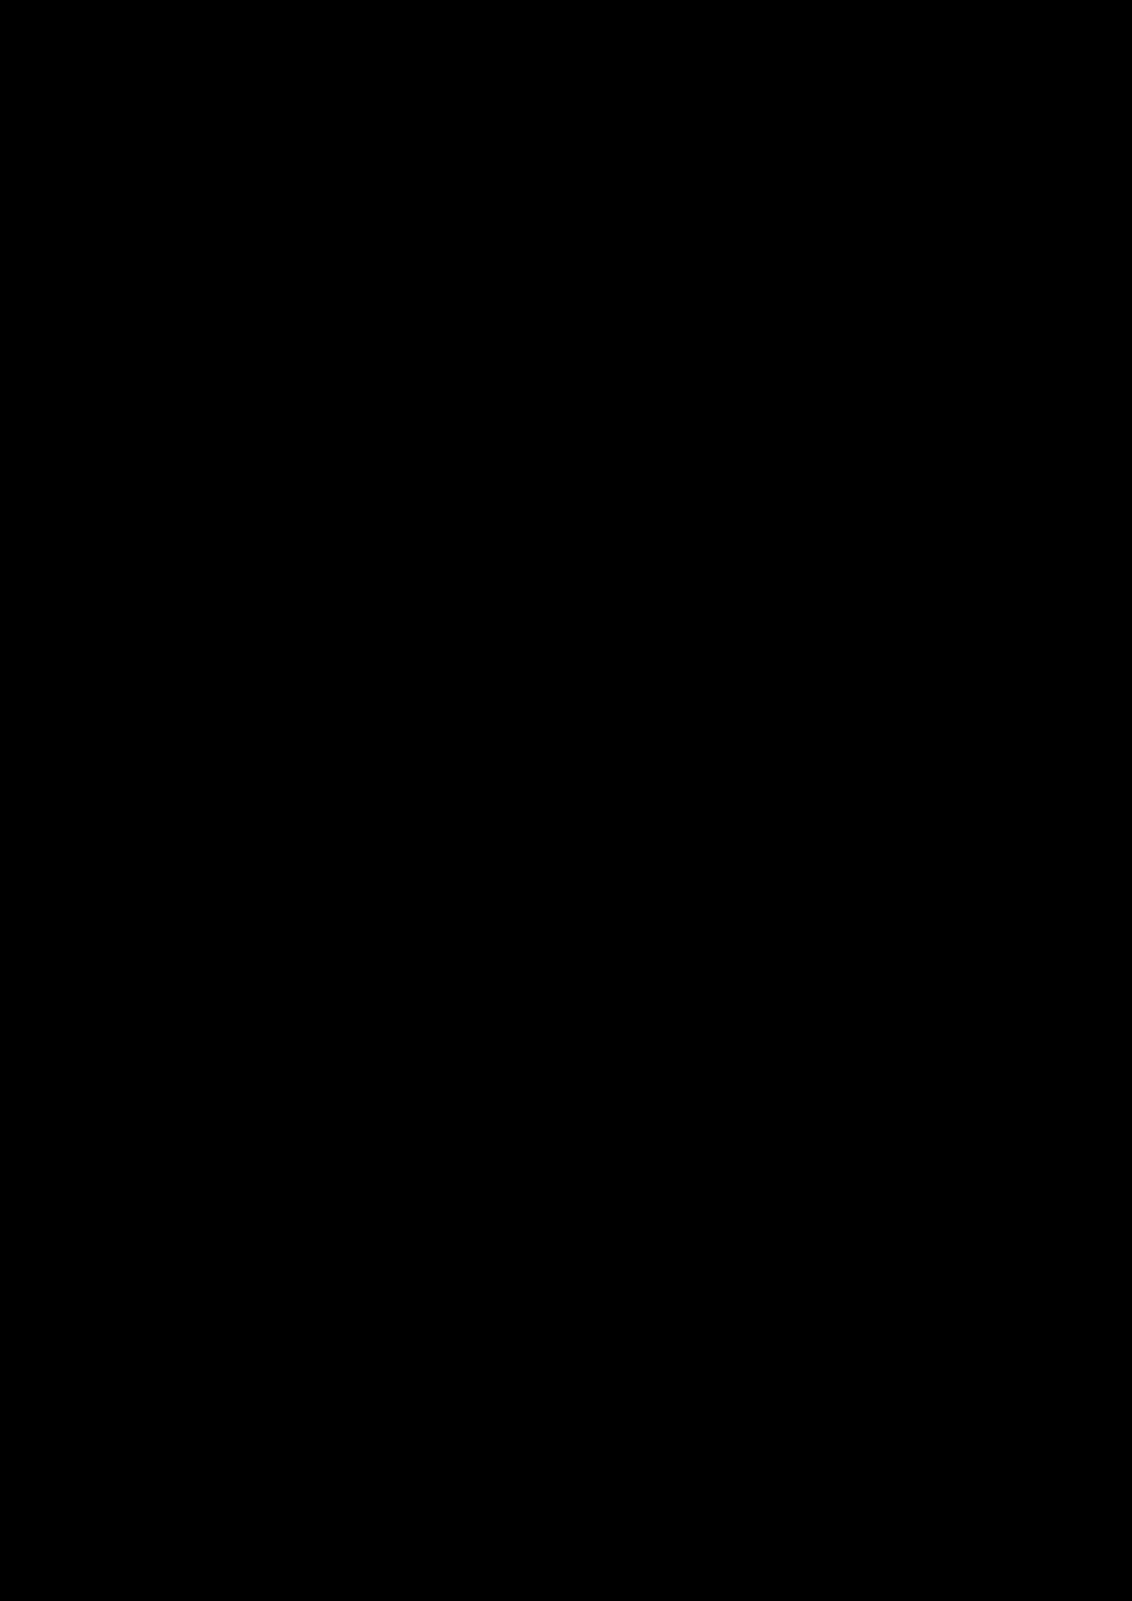 Belyiy sokol slide, Image 145